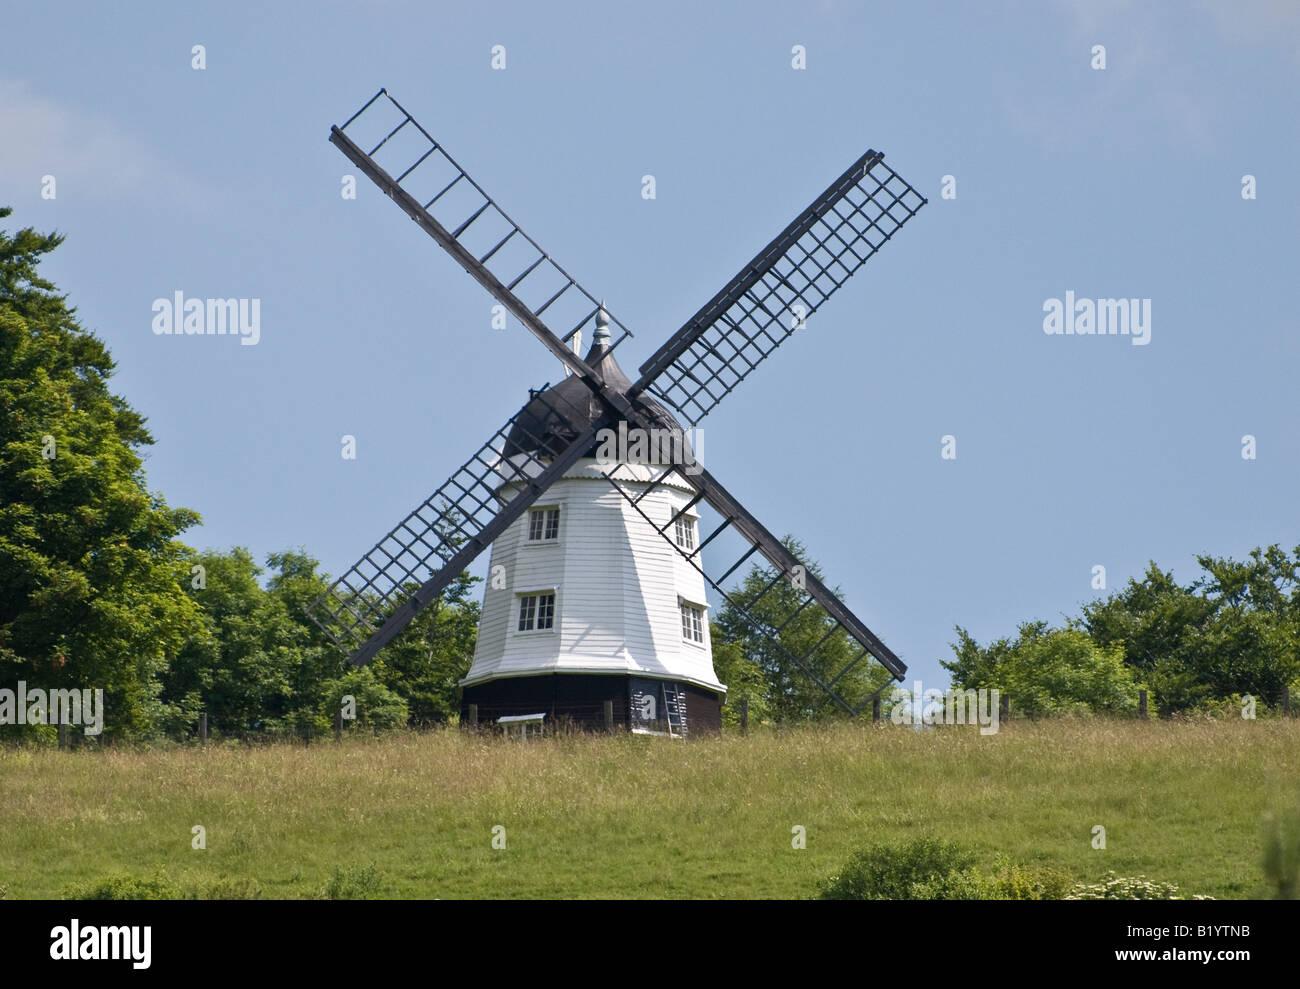 Turville Mill Buckinghamshire UK - Stock Image